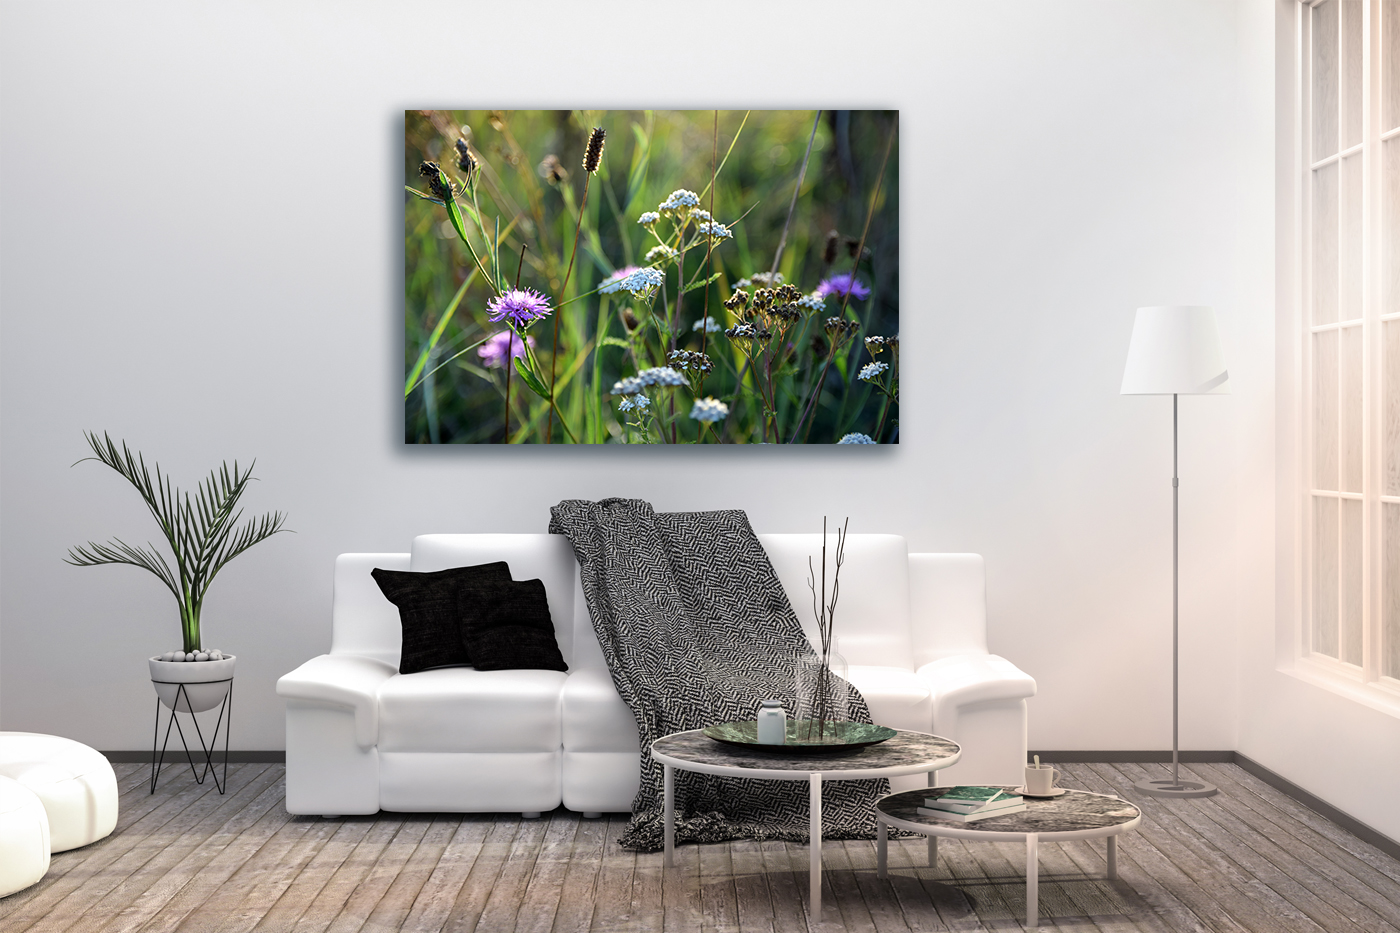 Nature photo, landscape photo, floral photo, summer photo, example image 2